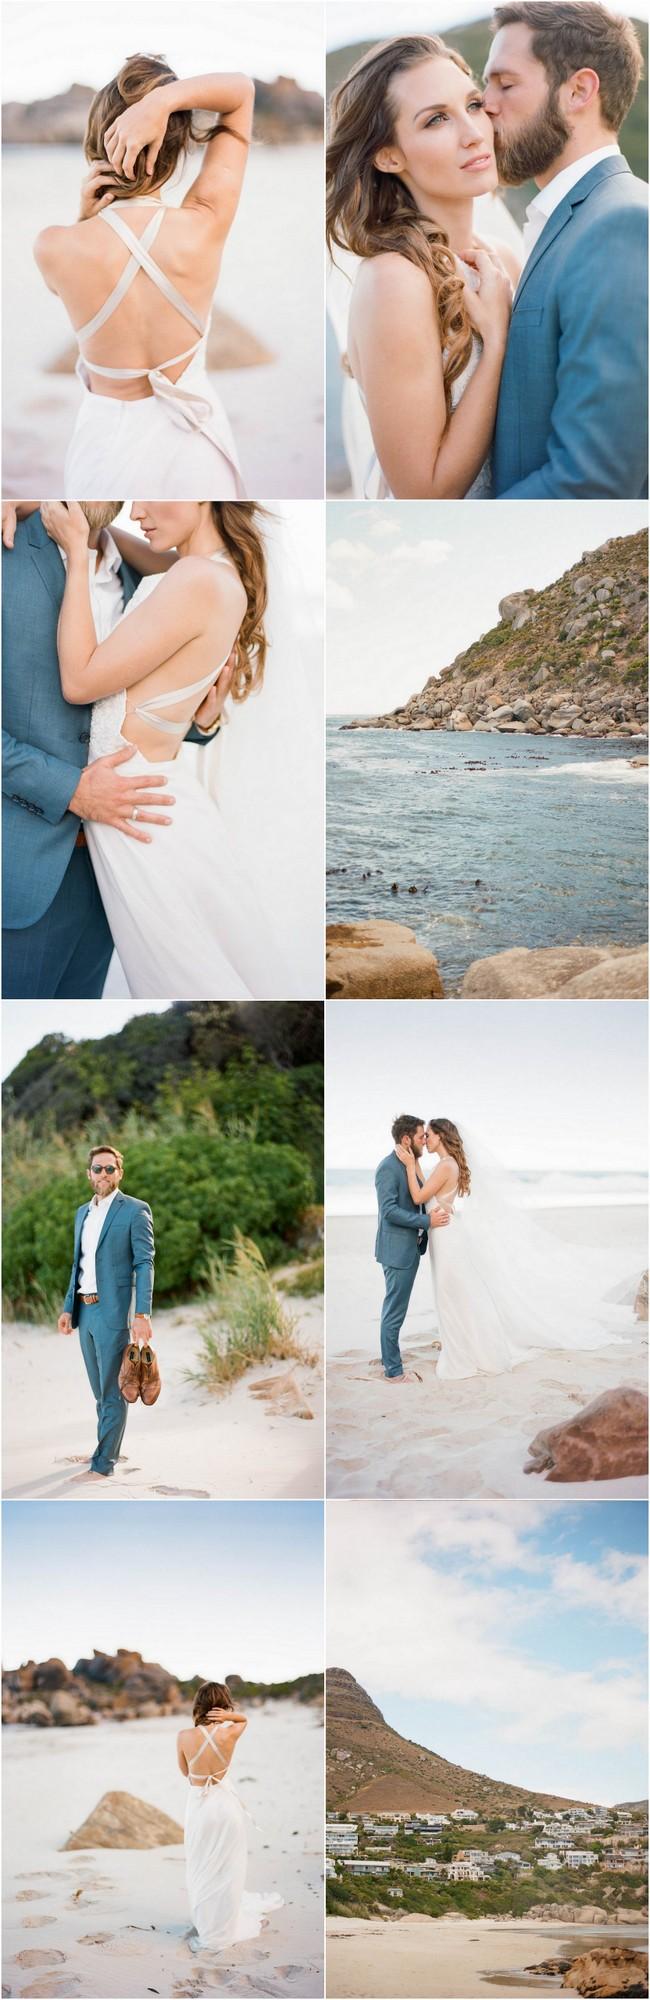 Romantic Cape Town Beach Bride 3